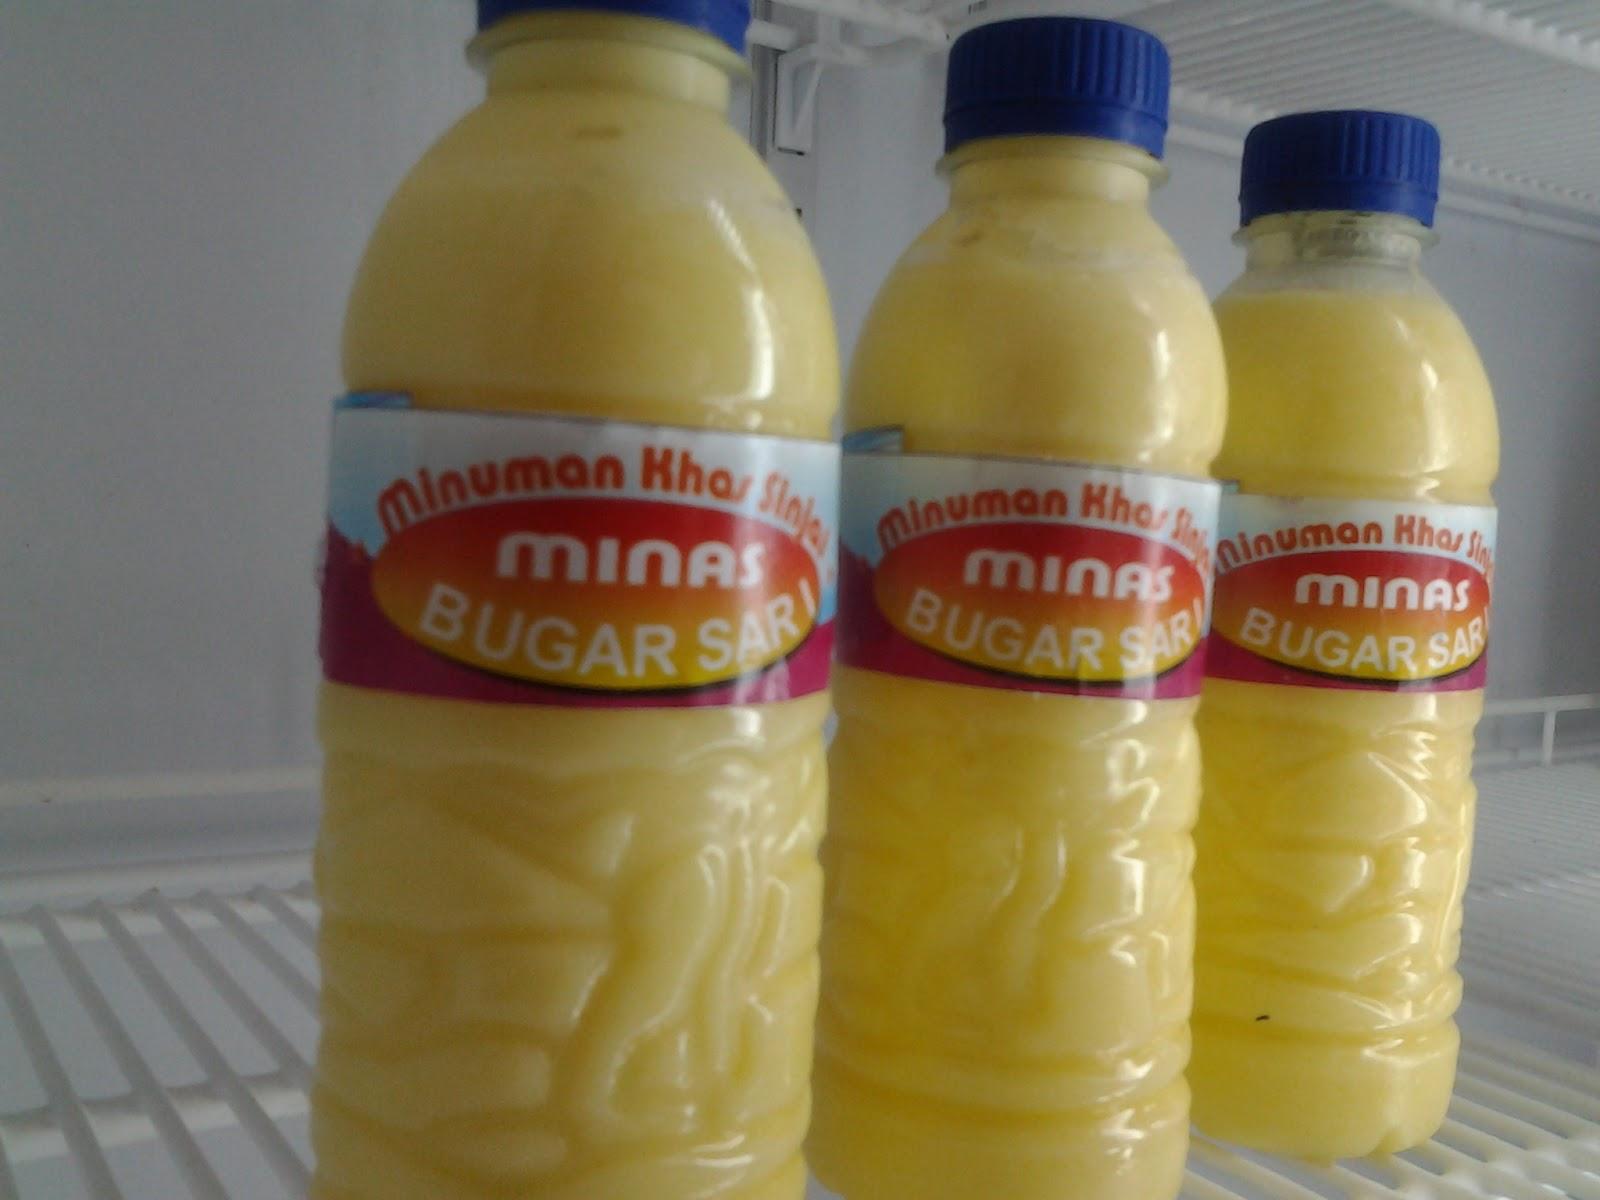 Mengenal Minuman Khas Sinjai Badai Timur